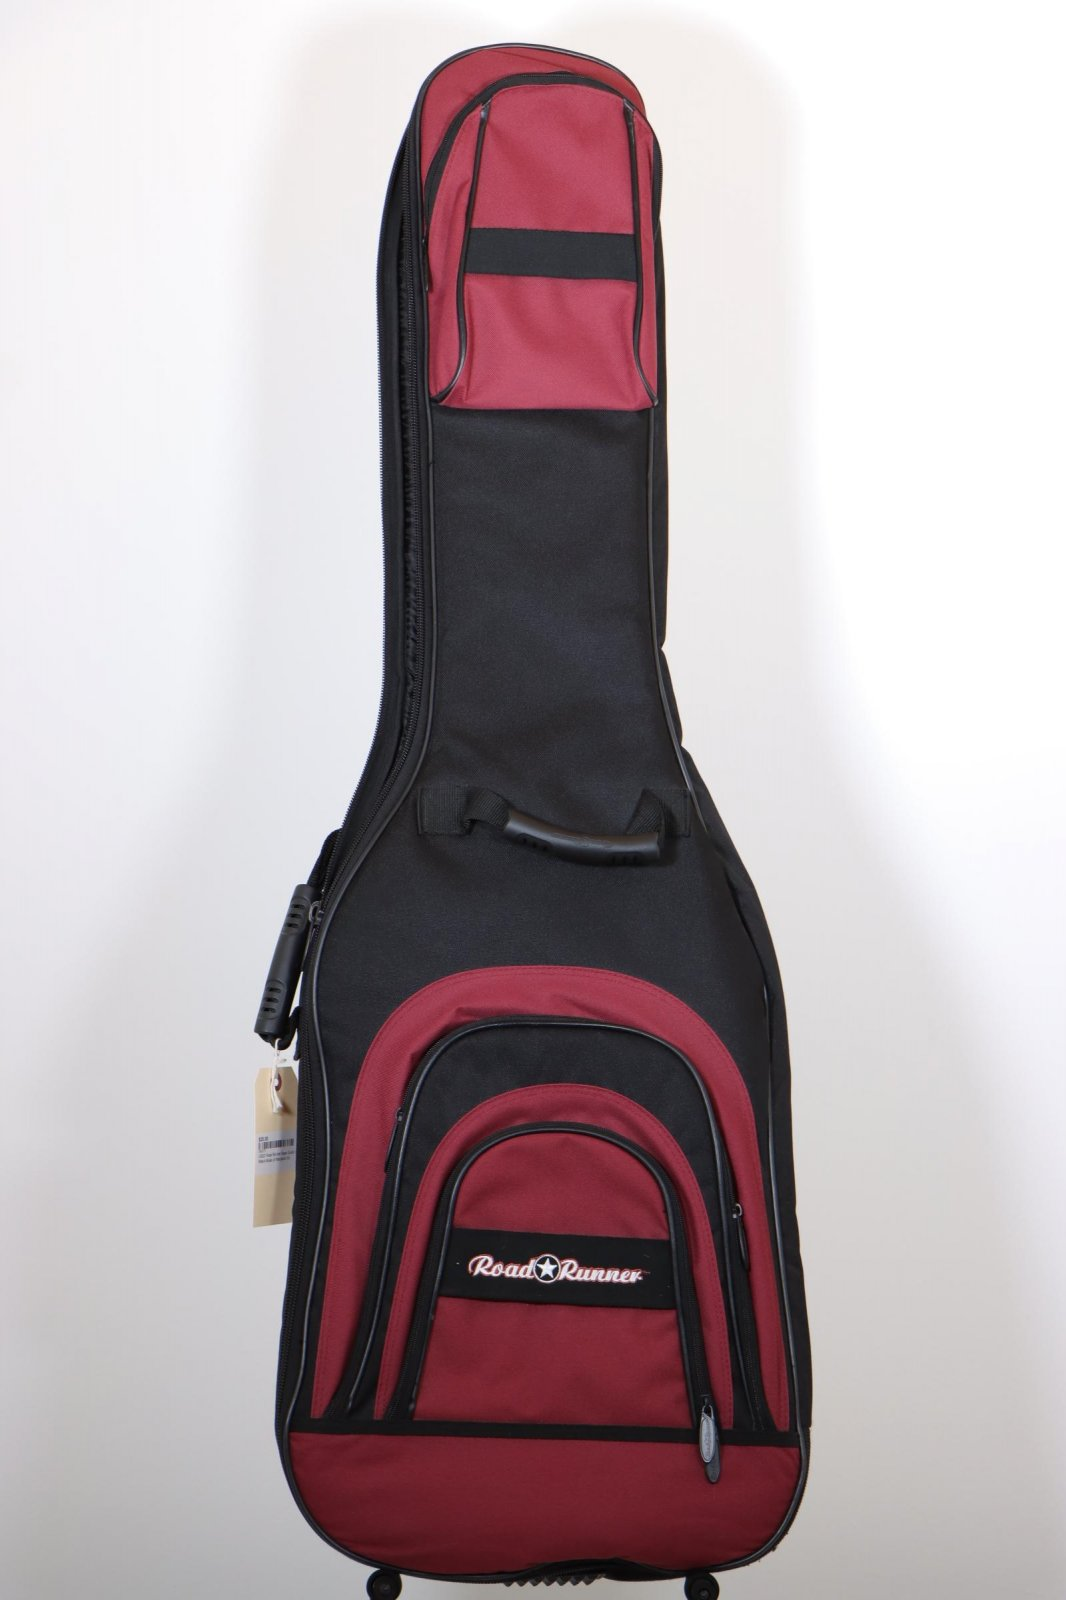 USED Road Runner Bass Guitar Gig Bag